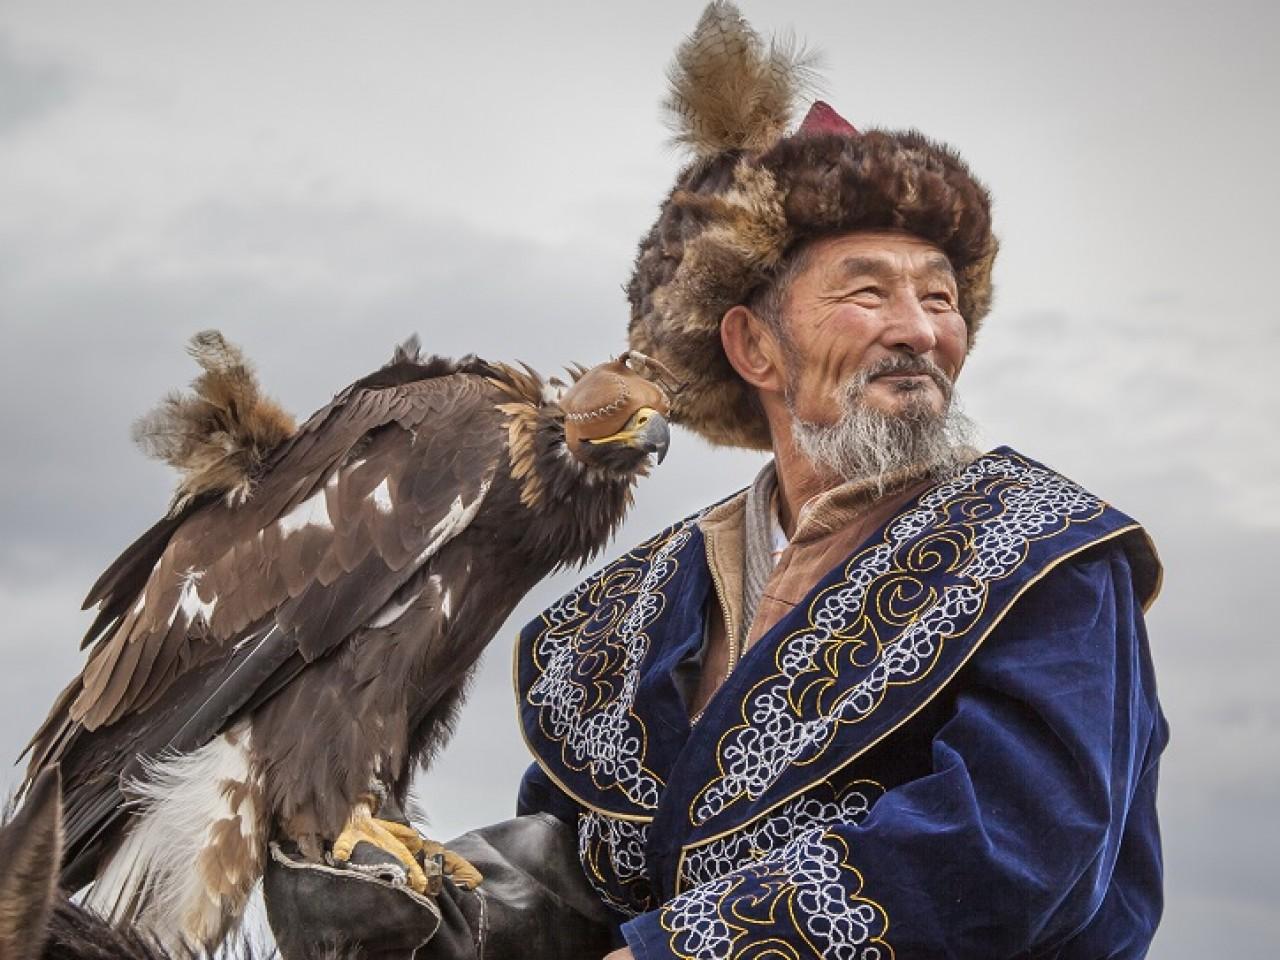 MONGOLIA, DOVE OSANO LE AQUILE